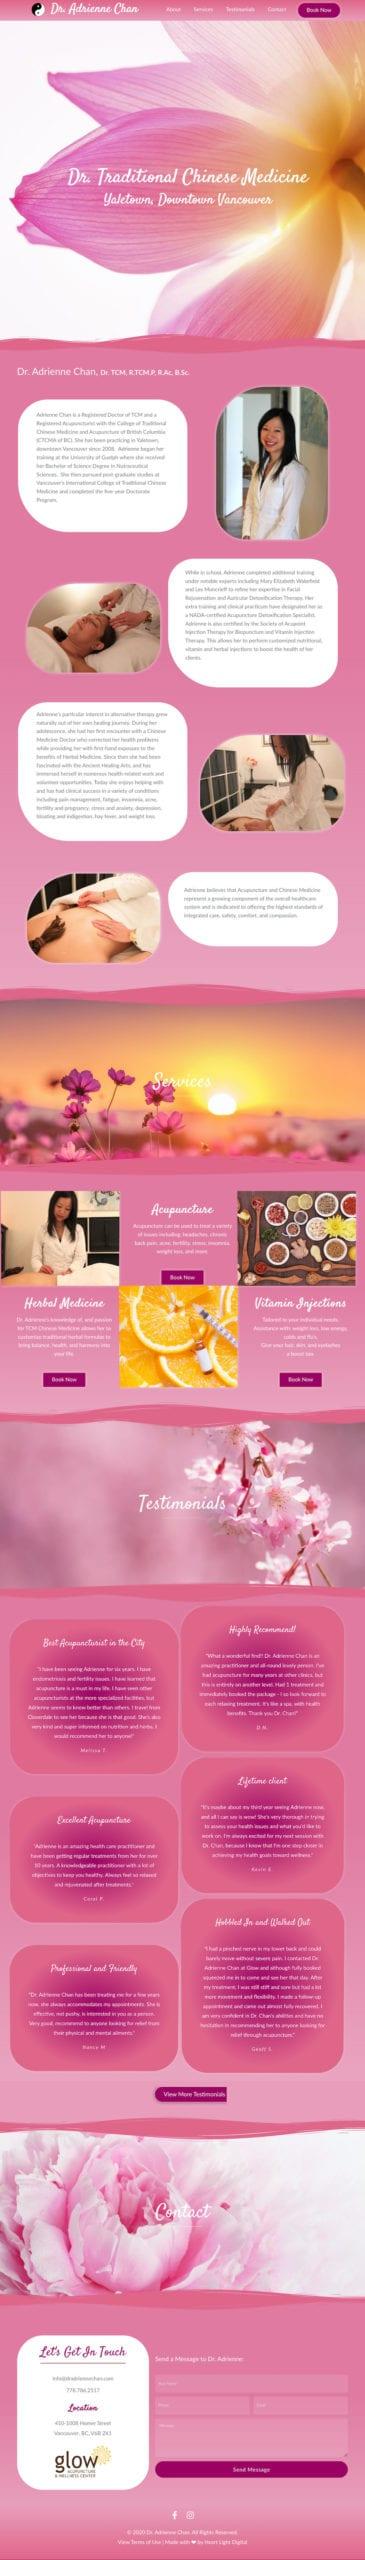 Dr Adrienne Chan Website